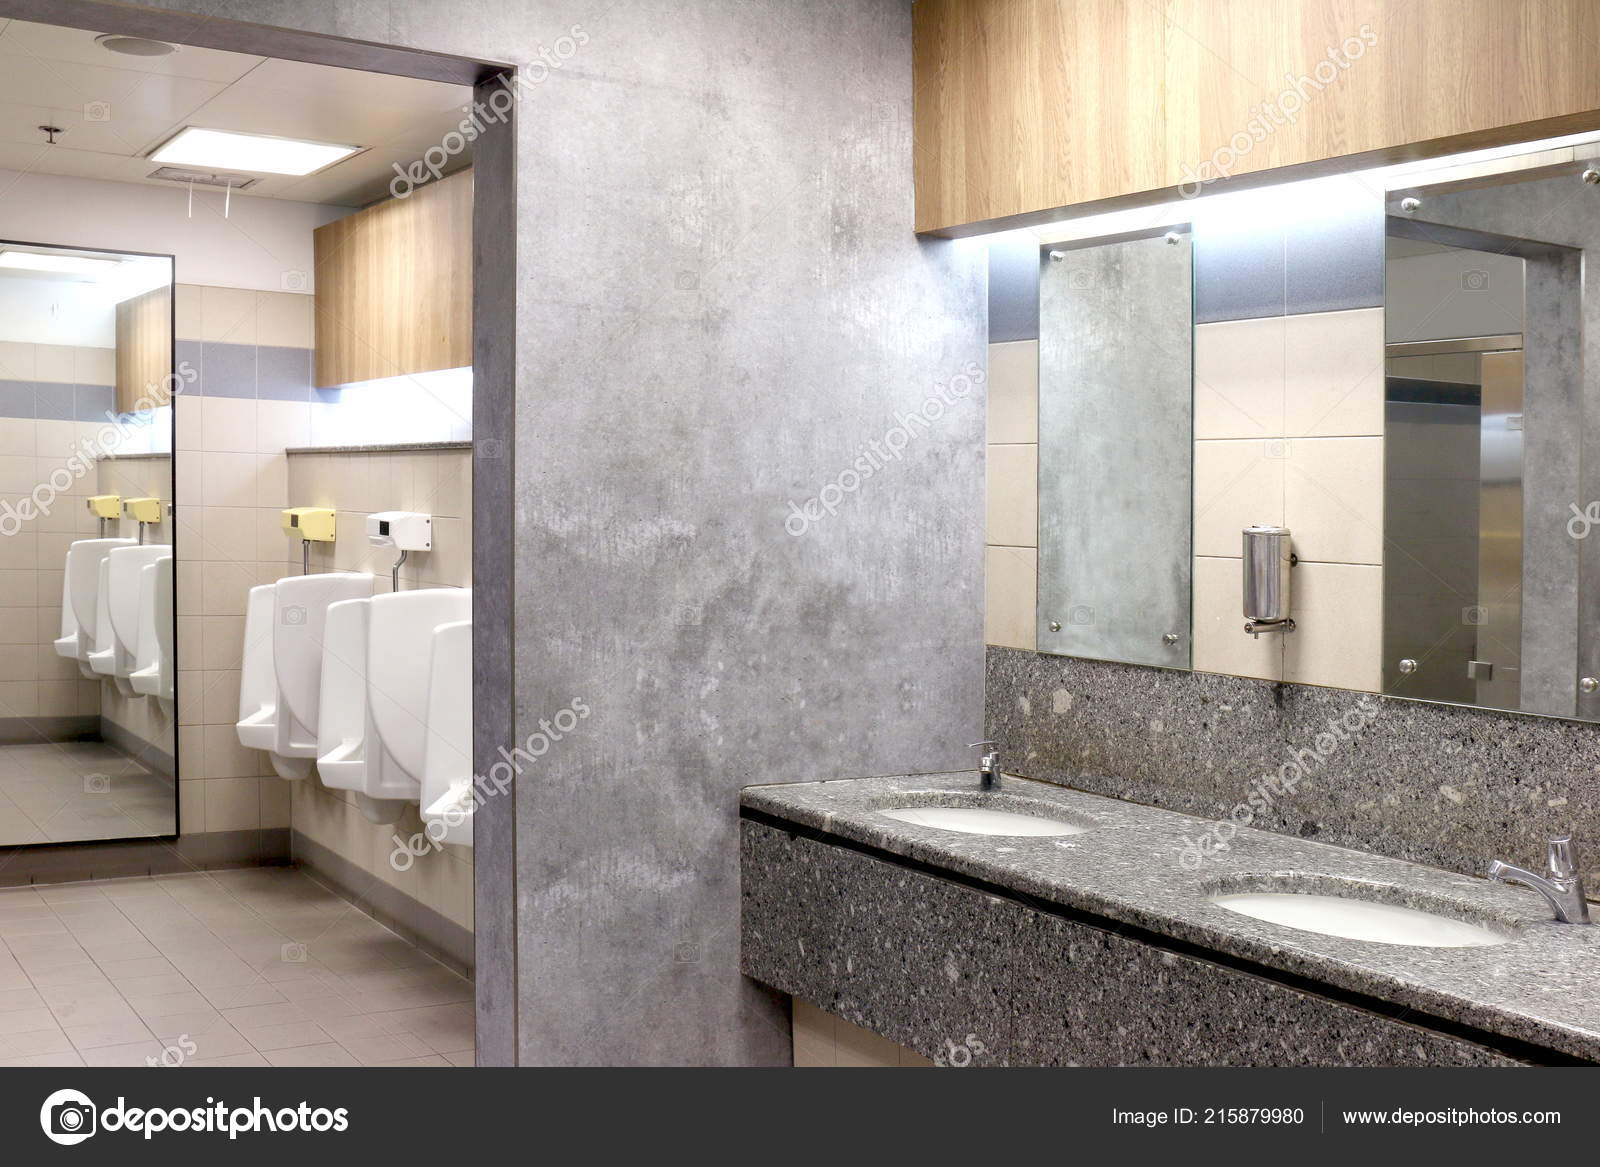 Moderne Toilette Toilette Raum — Stockfoto © cgdeaw #215879980